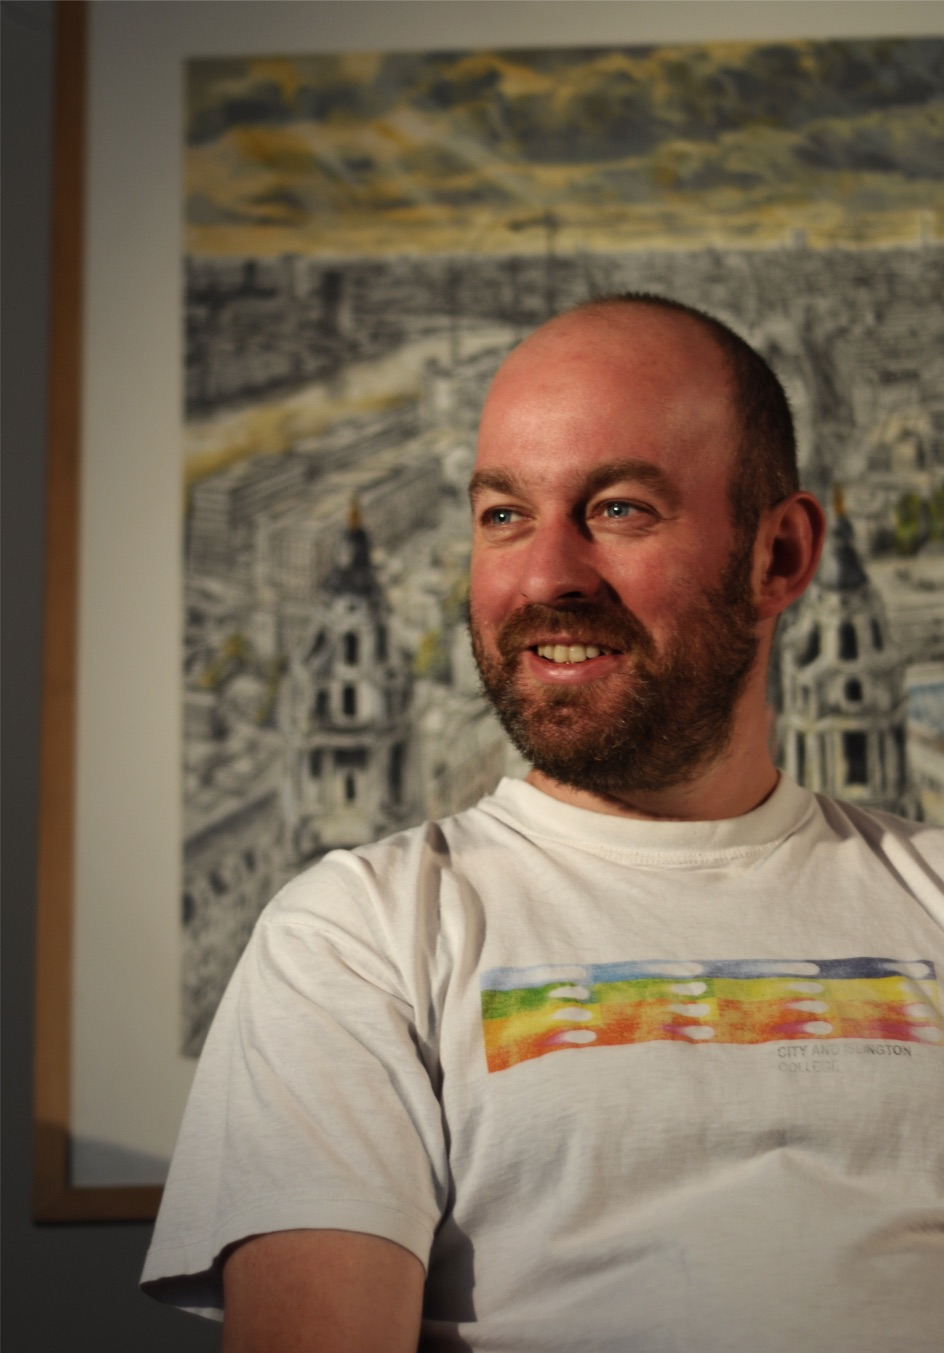 Artist David Downes paints public mural to launch new ITV